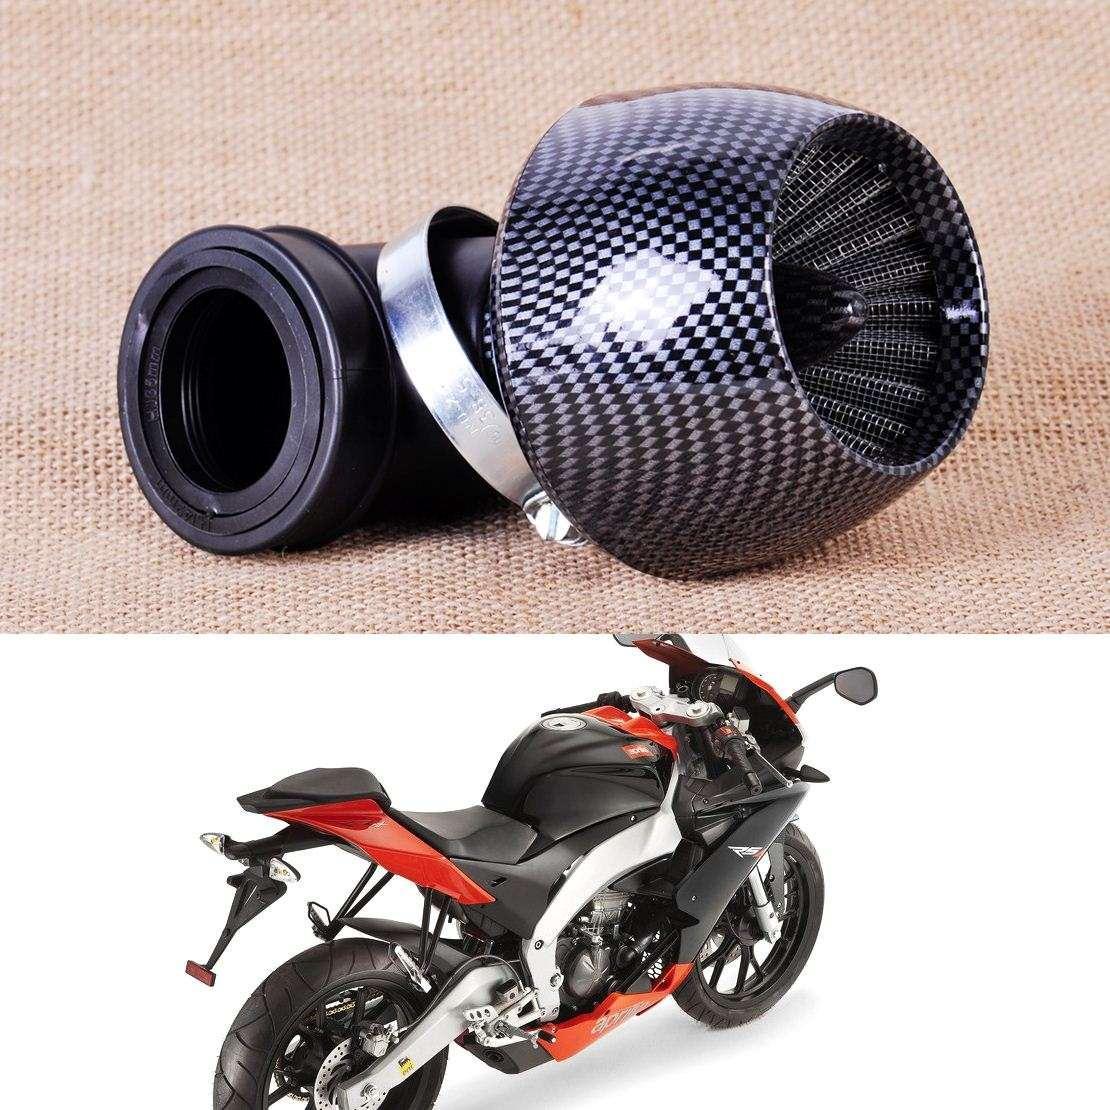 Filtro de aire para motocicleta ATV de 150cc-250cc Universal Filtro de aire de fibra de carbono de motocicleta 35mm